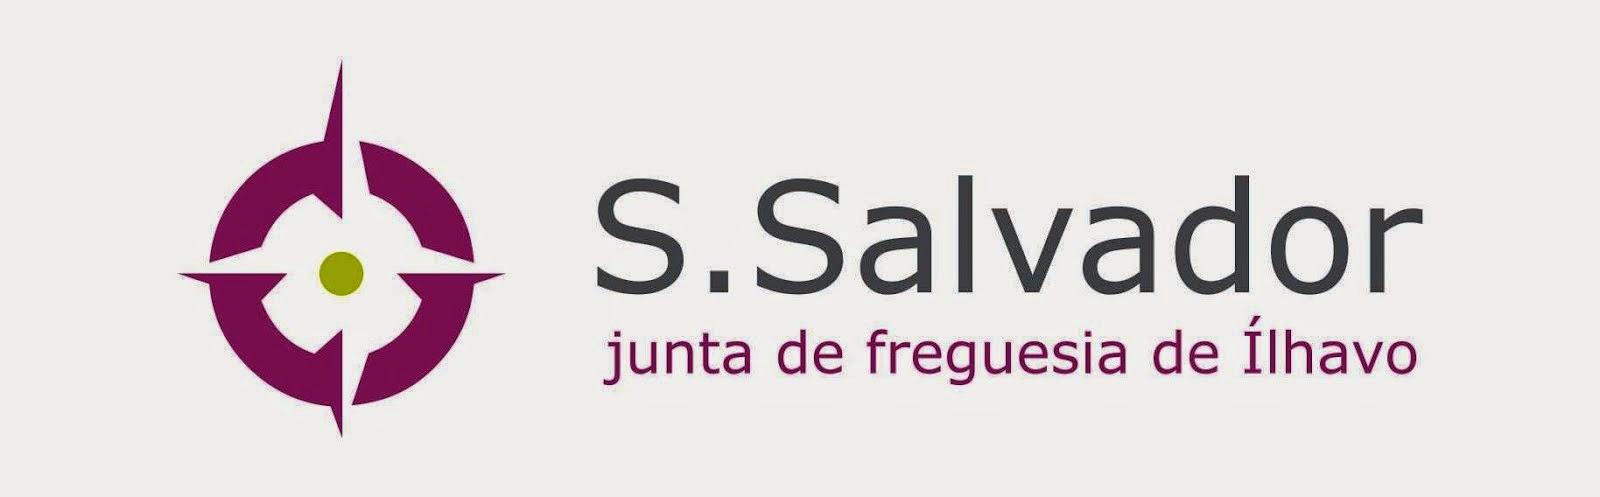 PARCERIA - Junta de Freguesia de S Salvador